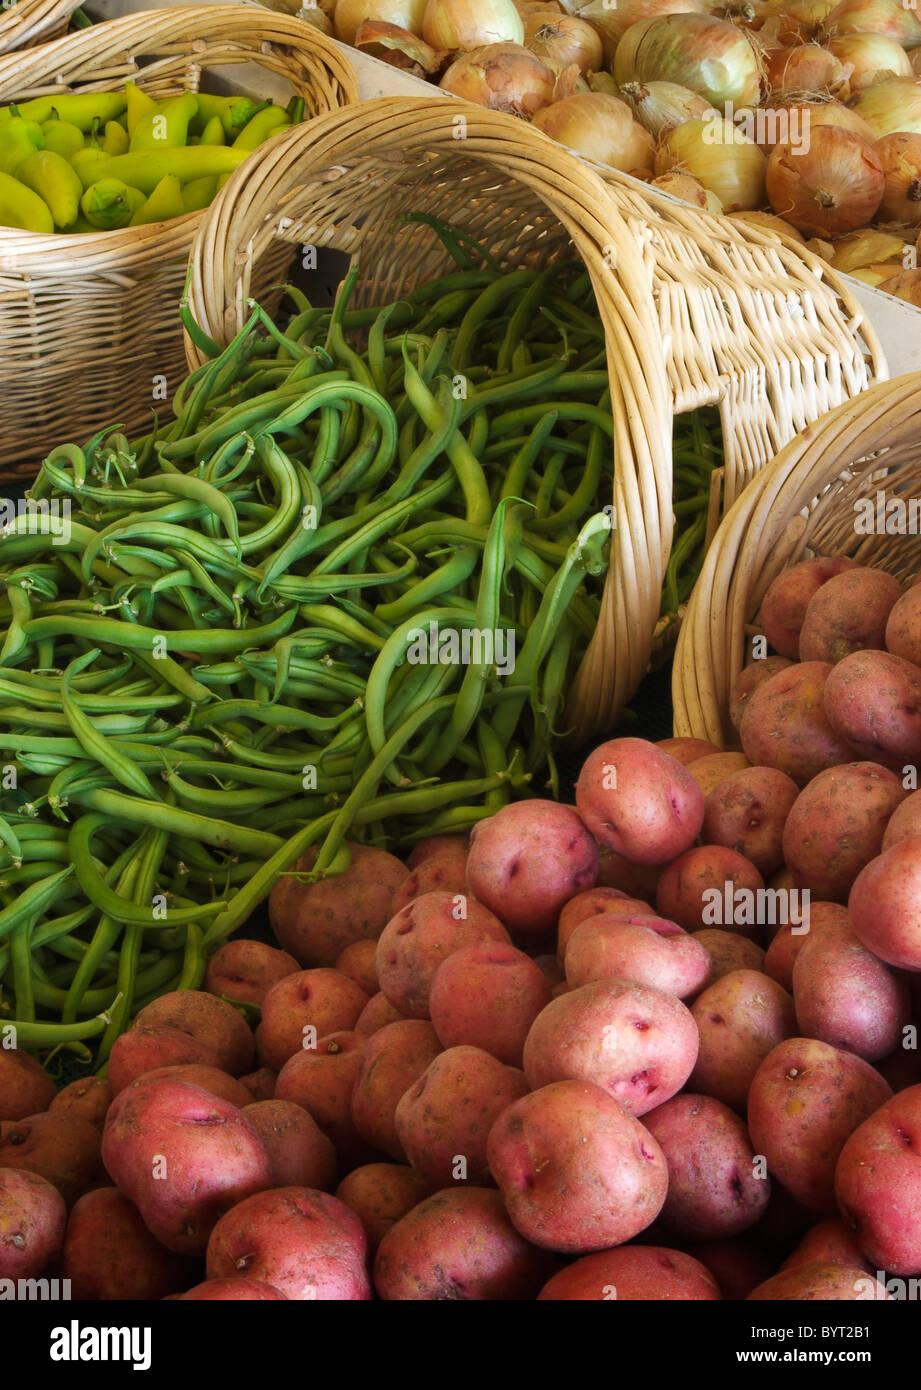 Fresh produce for sale at Tucker Farms, Sunnyside, Yakima Valley, Washington. - Stock Image